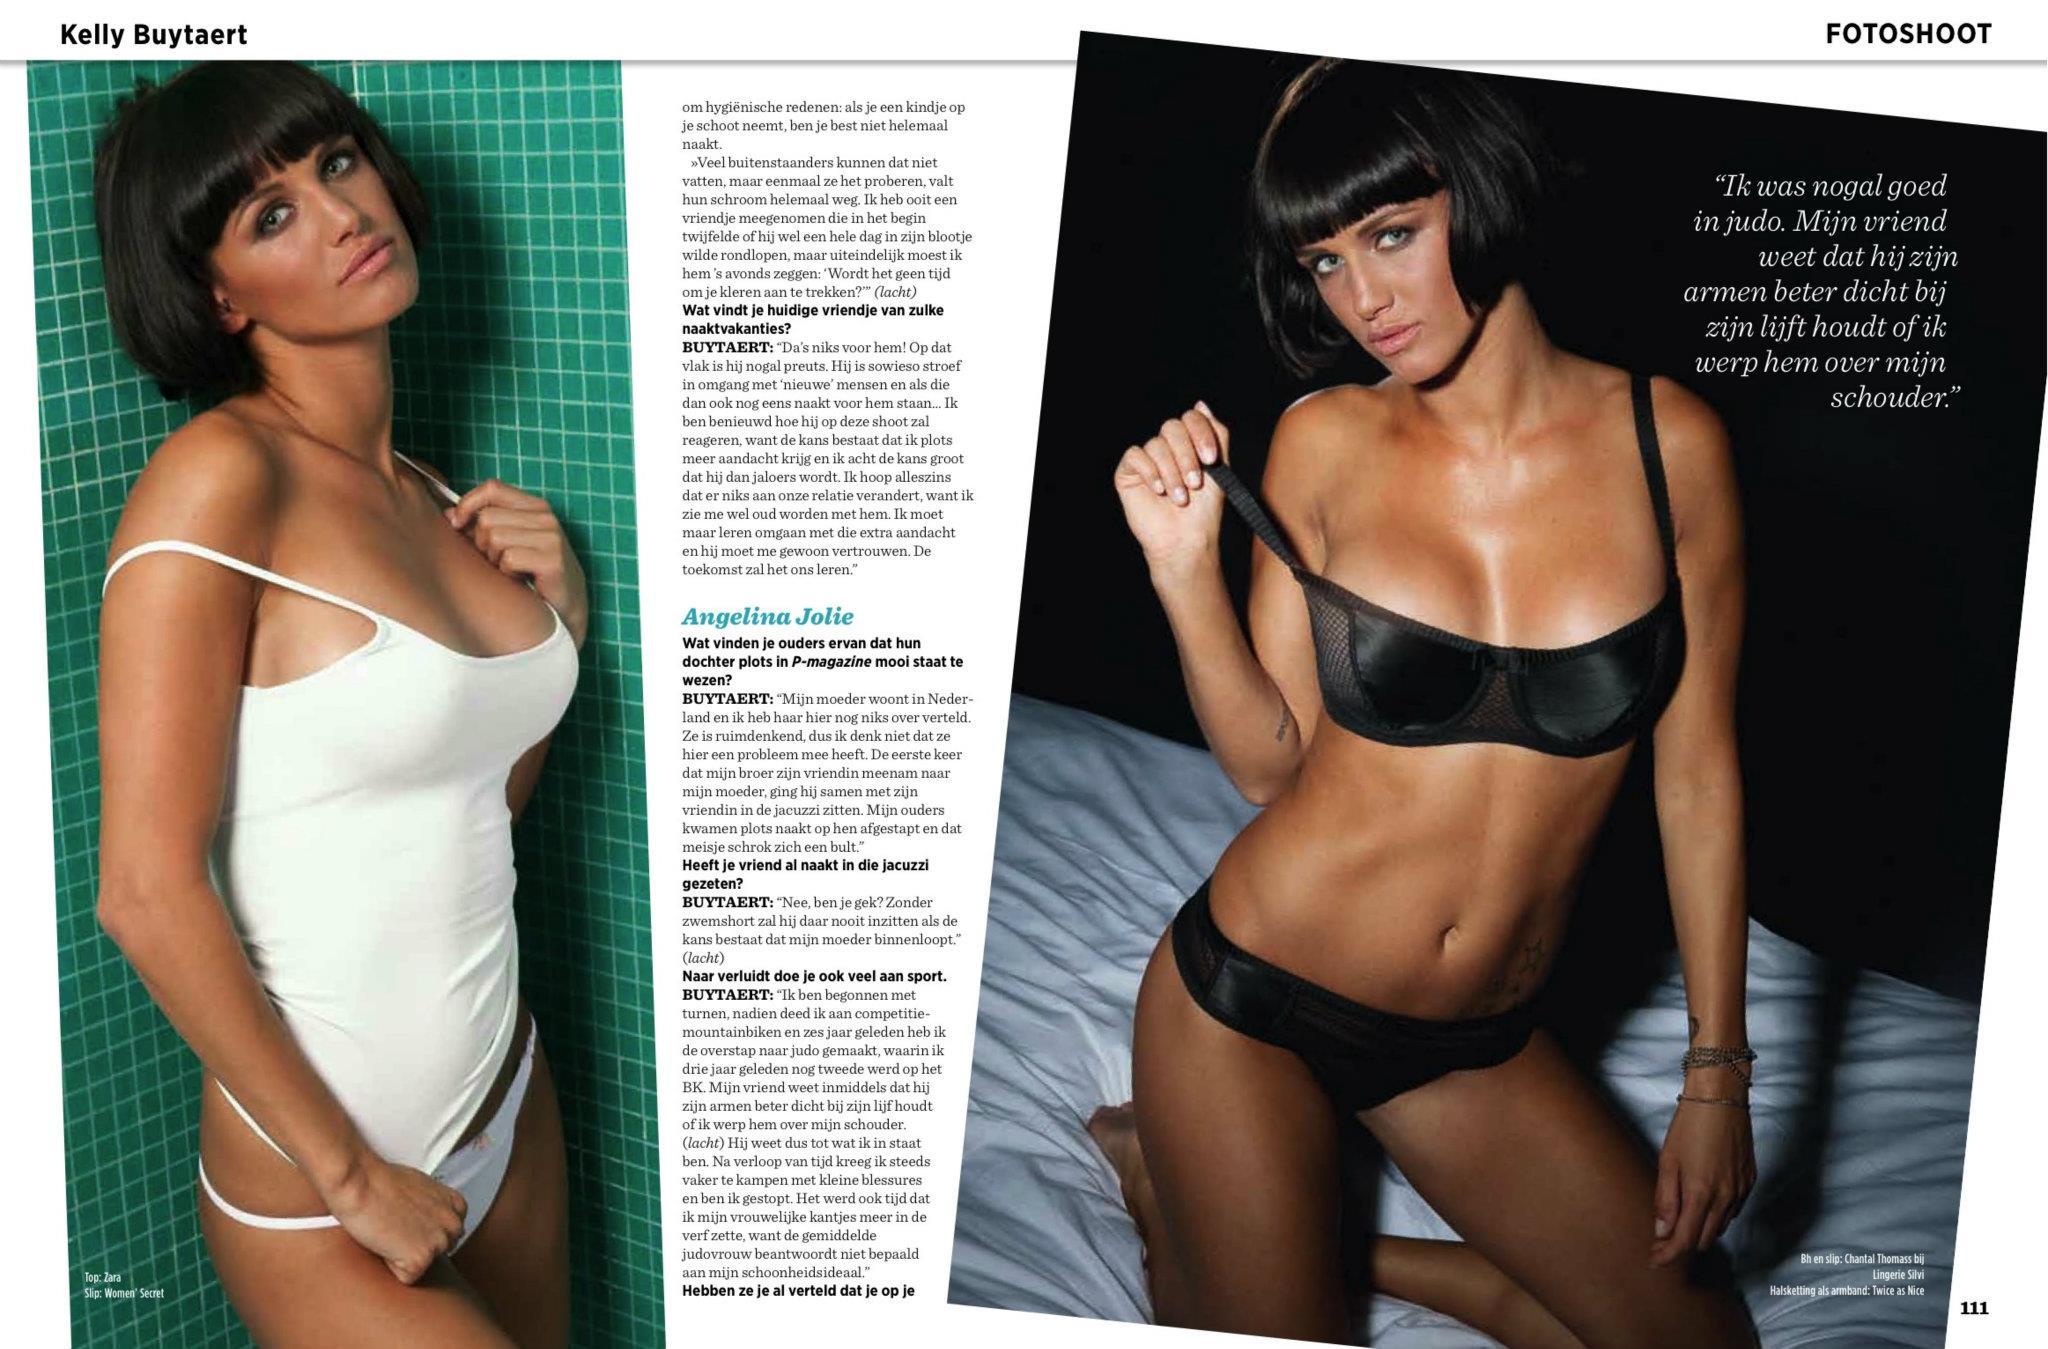 bart albrecht fotograaf photographer belgium p magazine che playboy editorial magazines glamour boudoir daniela degraux kelly buytaert 0007.jpg